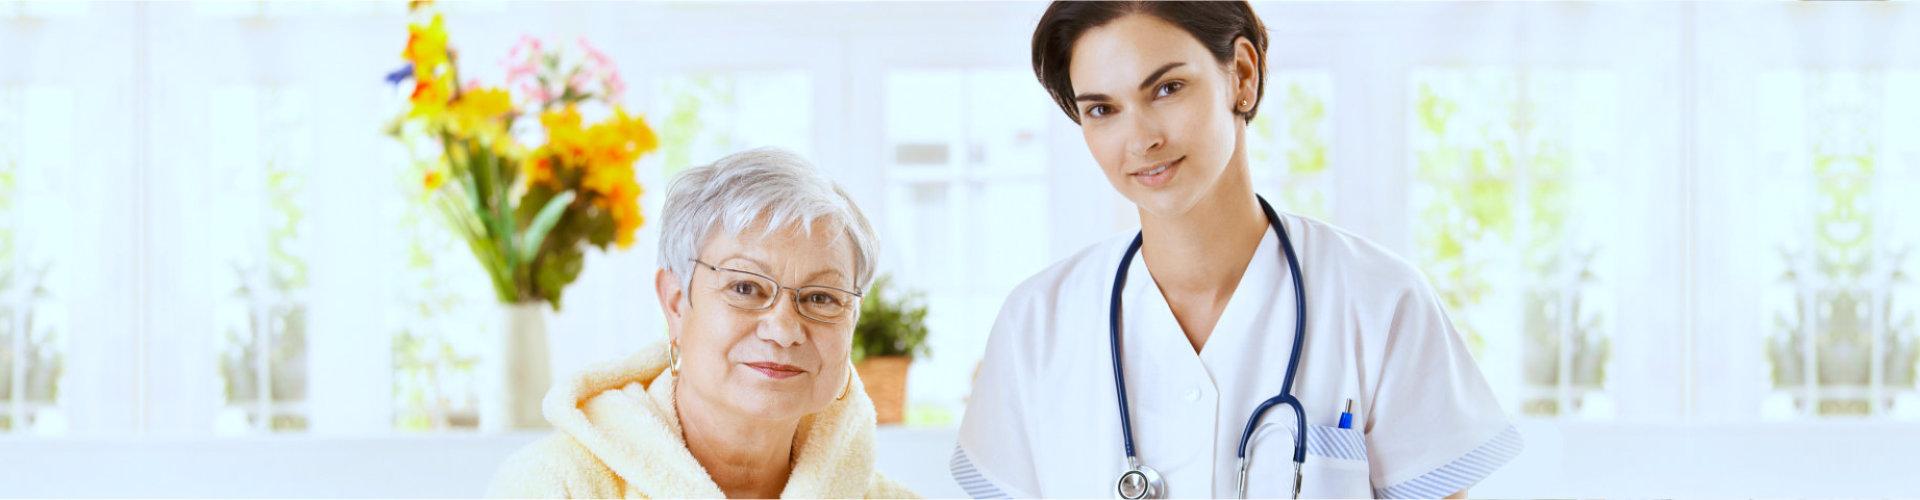 nurse with senior woman smiling